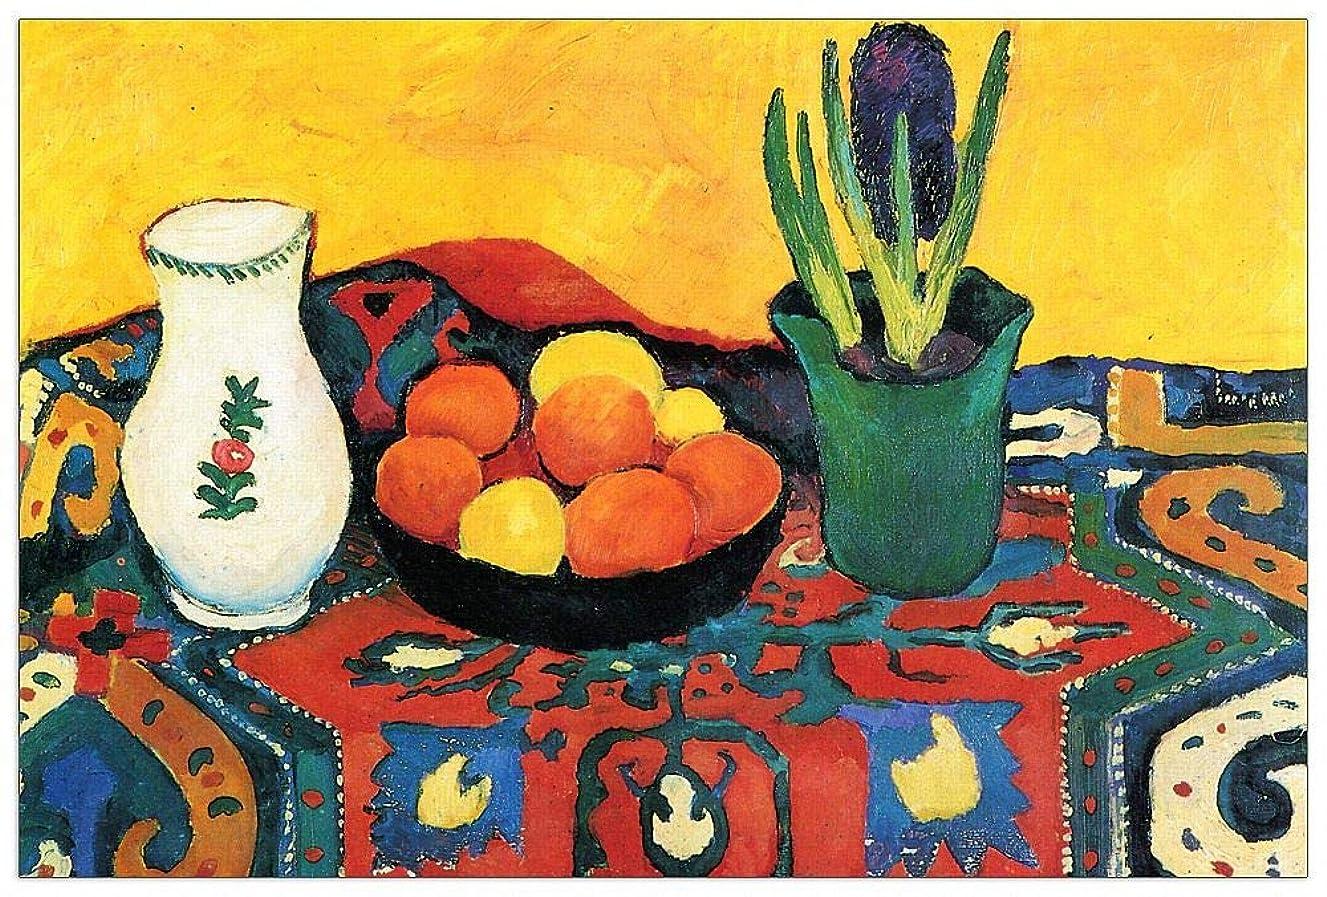 ArtPlaza TW91414 Macke August-Still Life with Hyacinthe Decorative Panel, 39.5x27.5 Inch, Multicolored